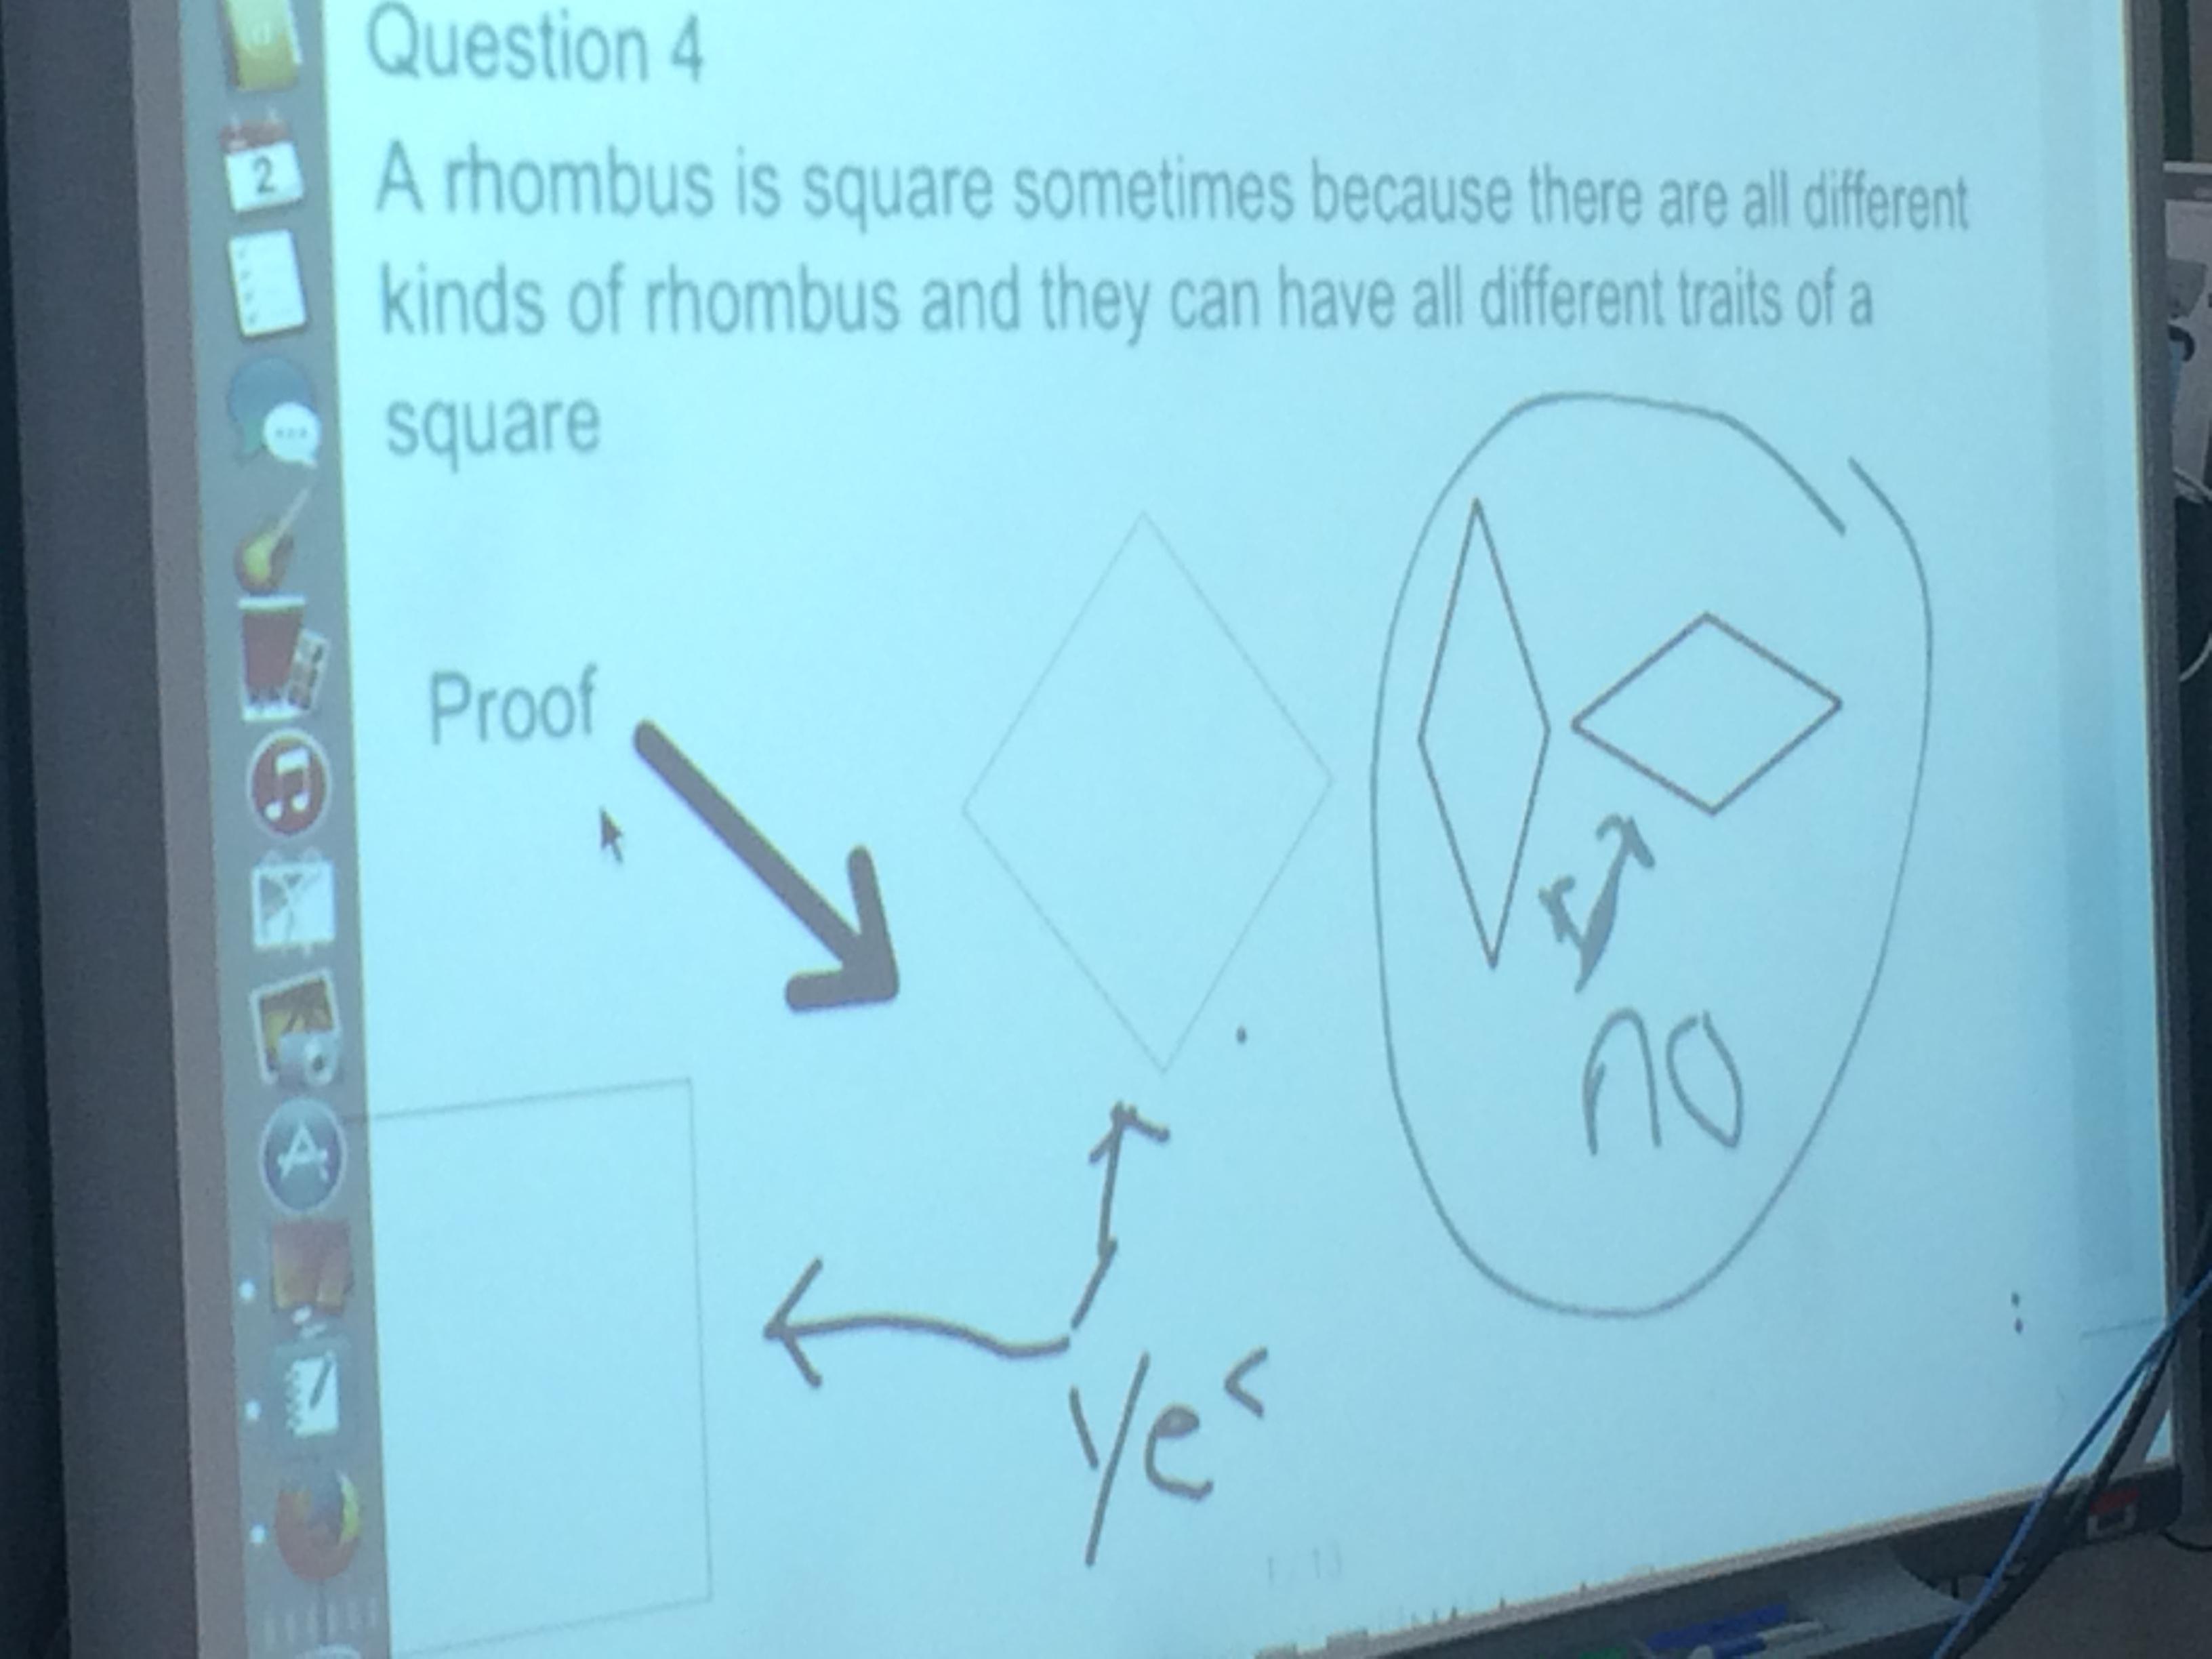 Making Claims | Math Minds